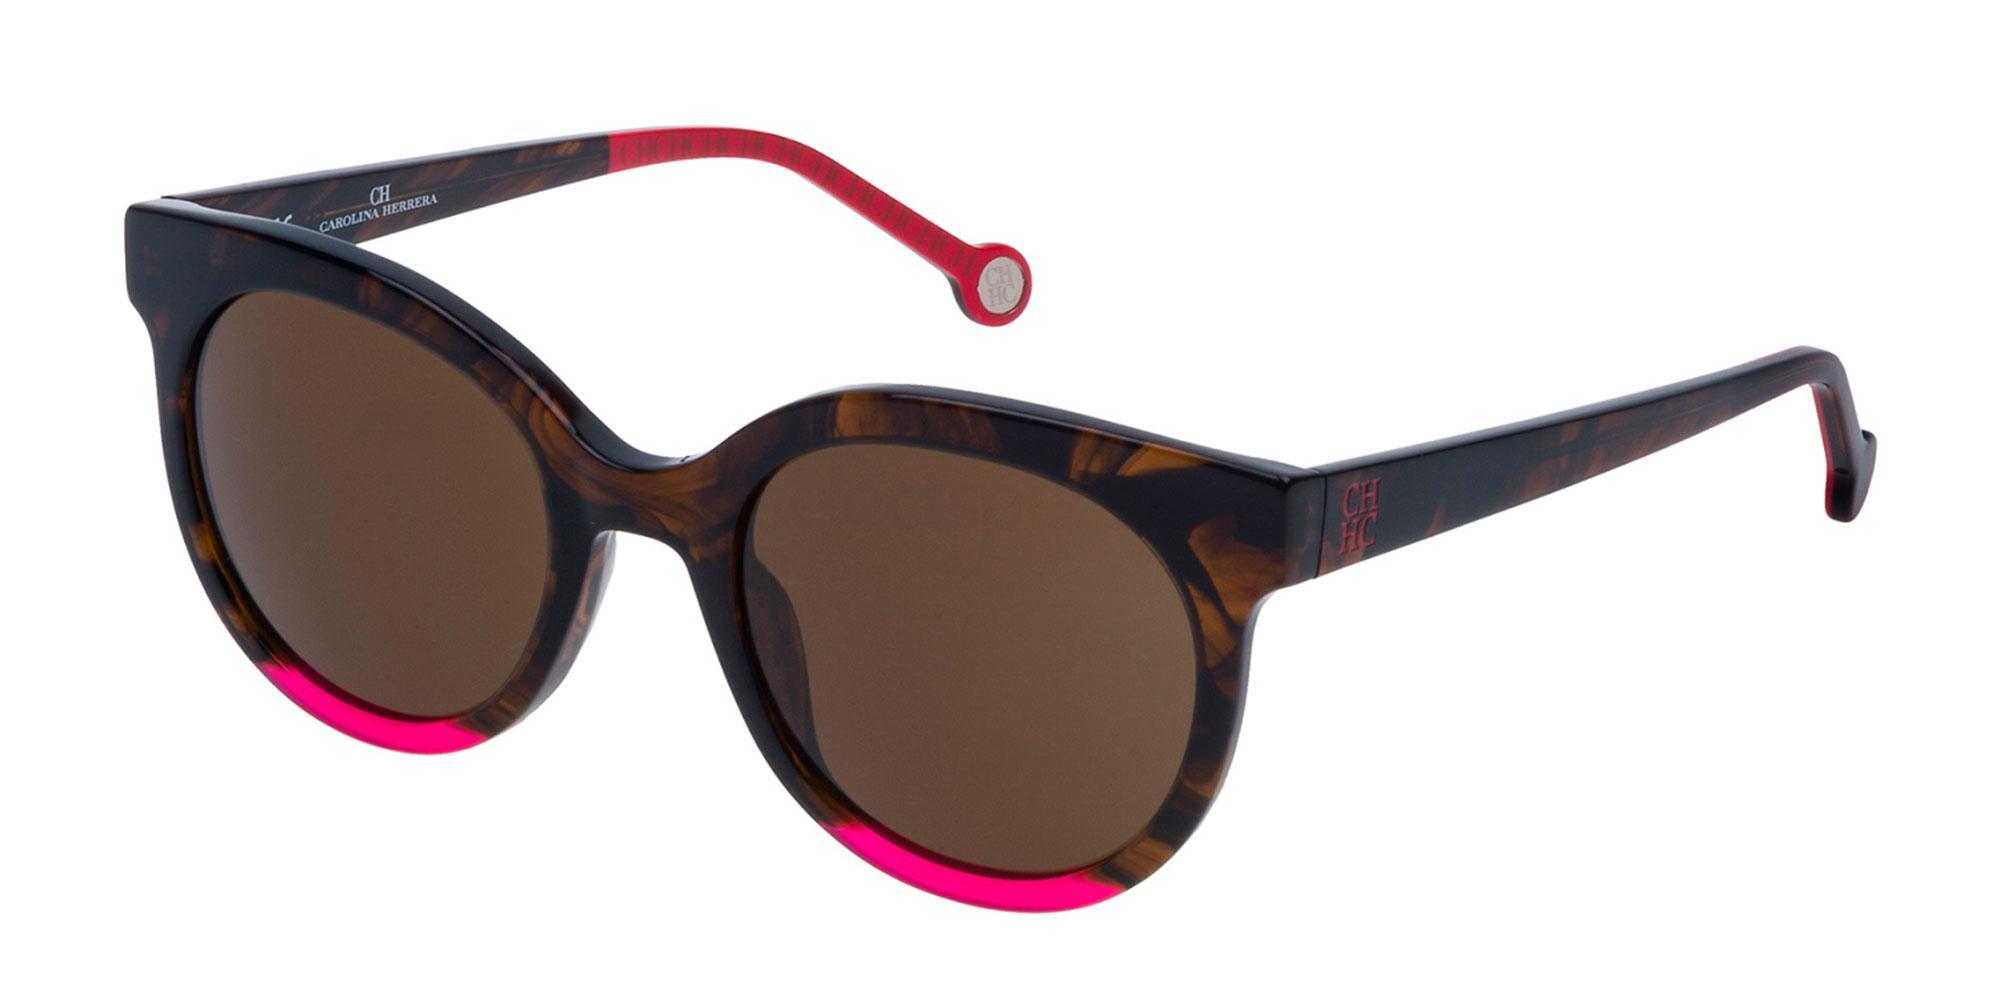 06YH SHE745 Sunglasses, CH Carolina Herrera